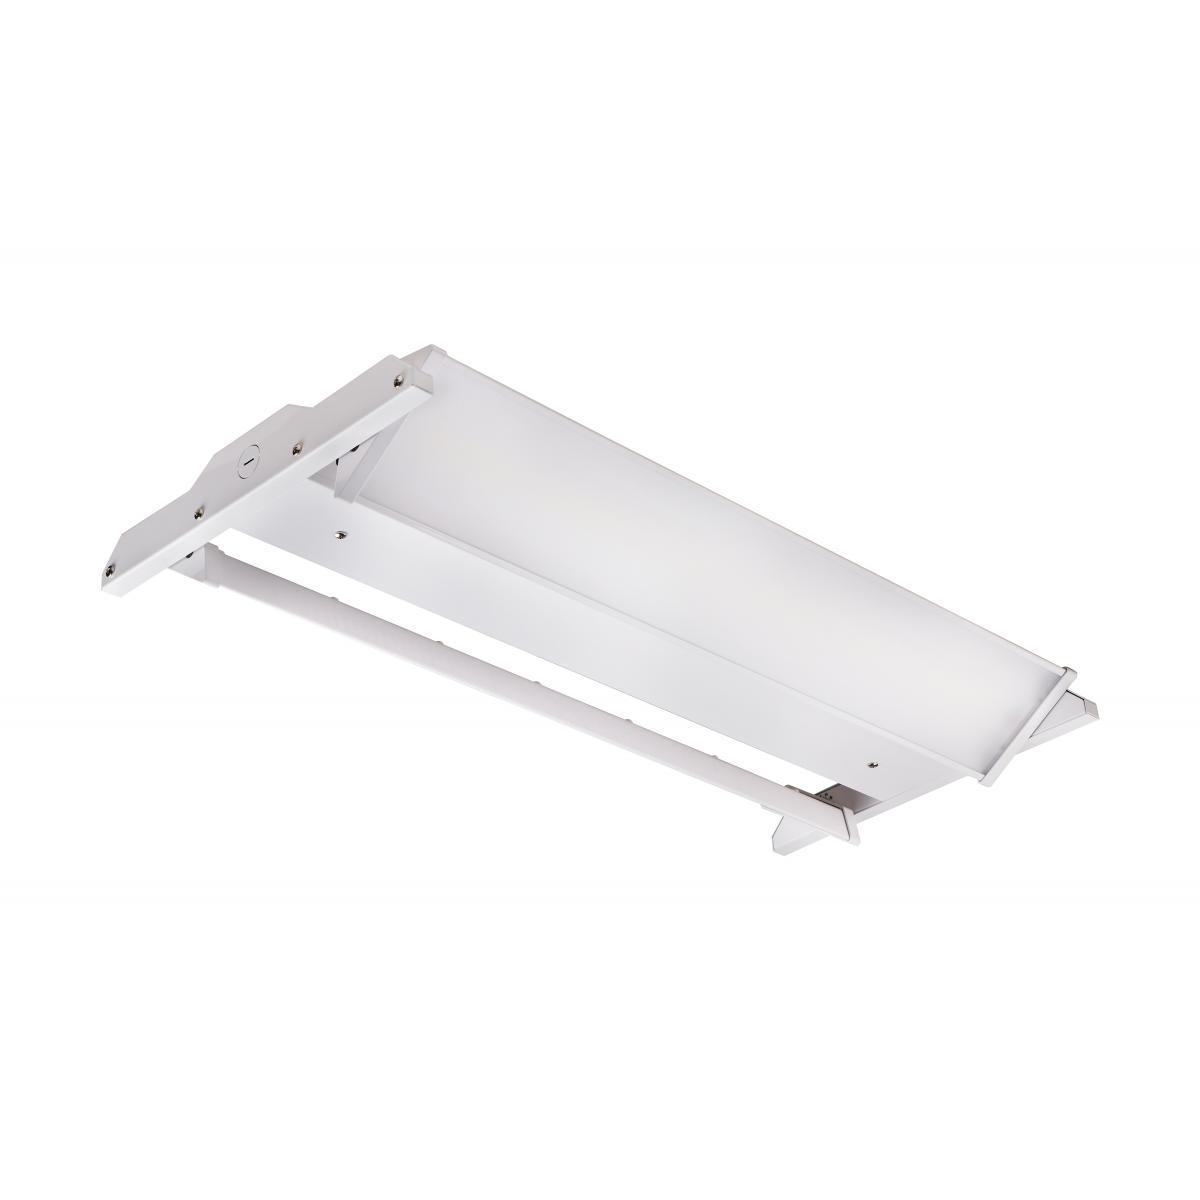 65-644 135W LED ADJUSTABLE HIGH BAY